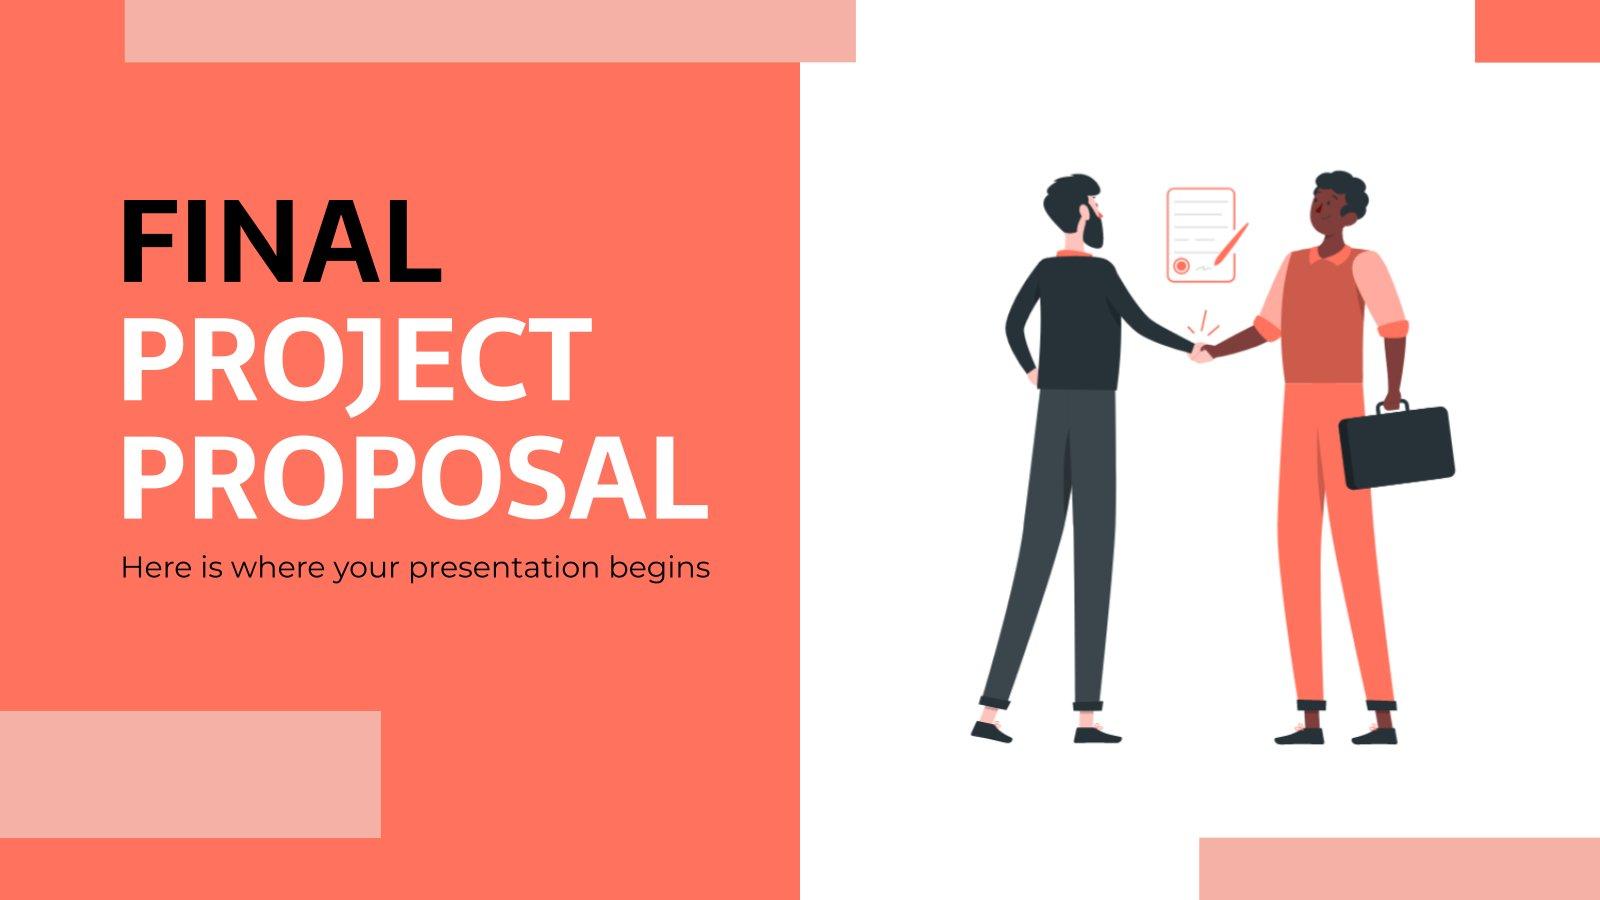 Final Project Proposal presentation template